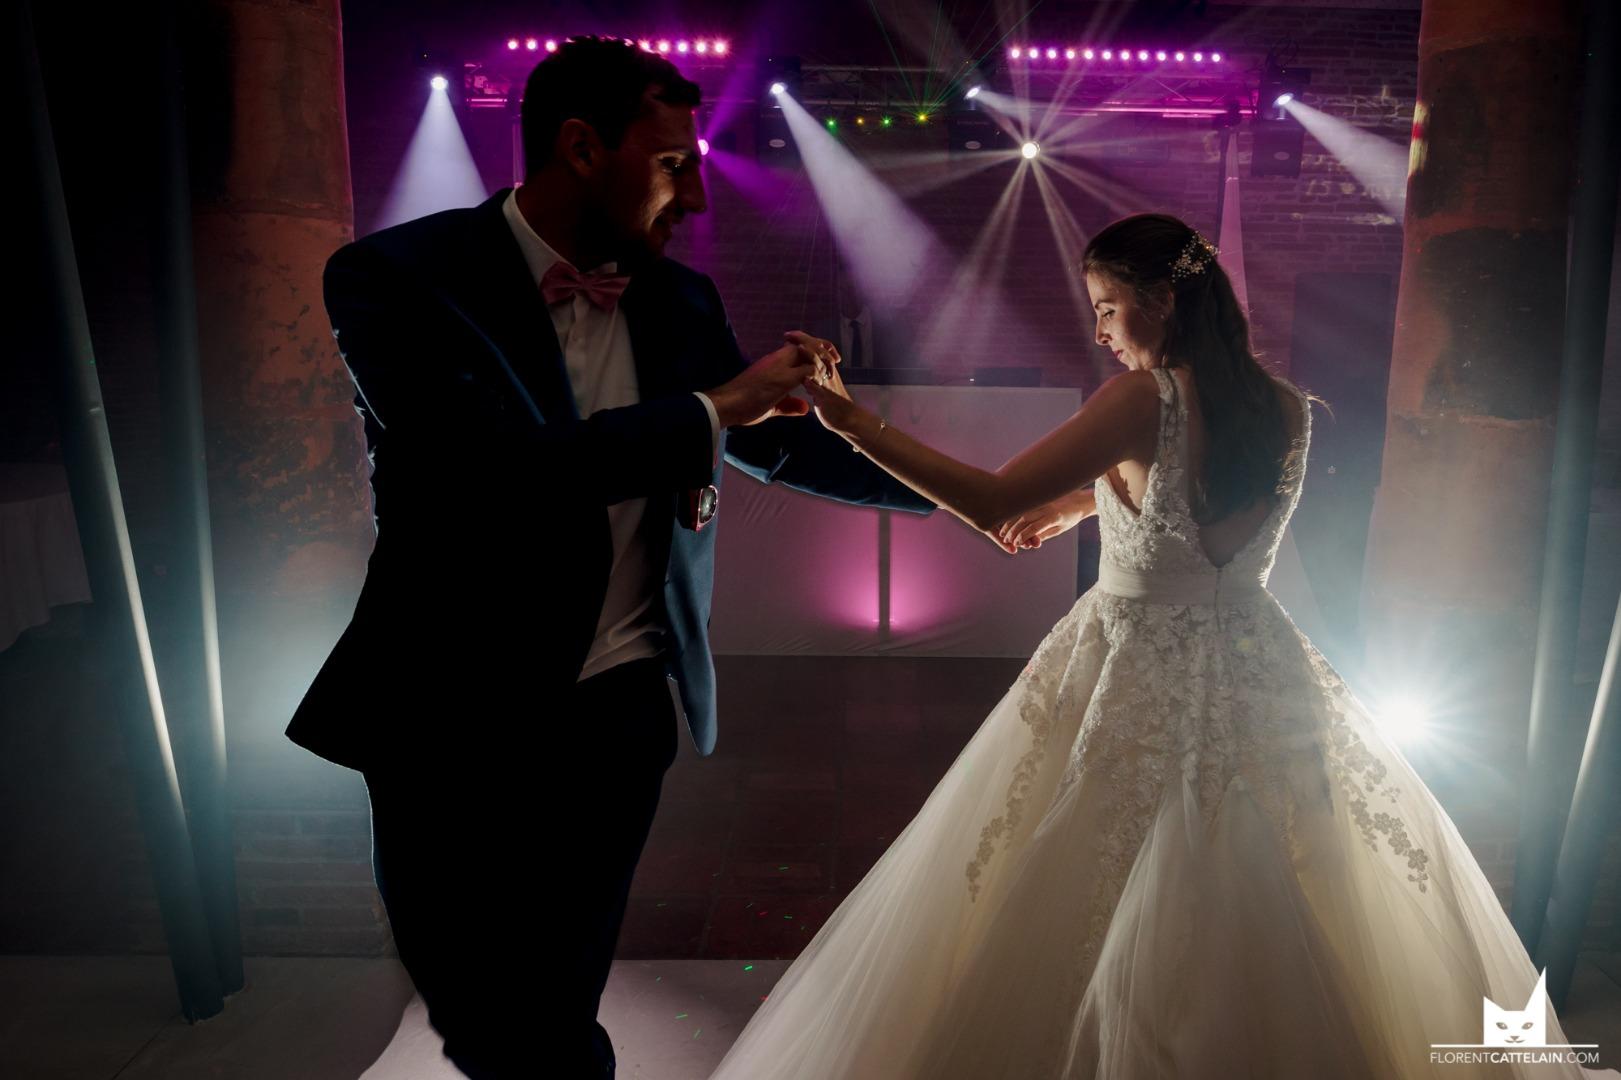 soiree-1ere-danse---mariage-domaine-montjoie-toulouse---wedding-planner-toulouse-la-dolce-vita.jpg